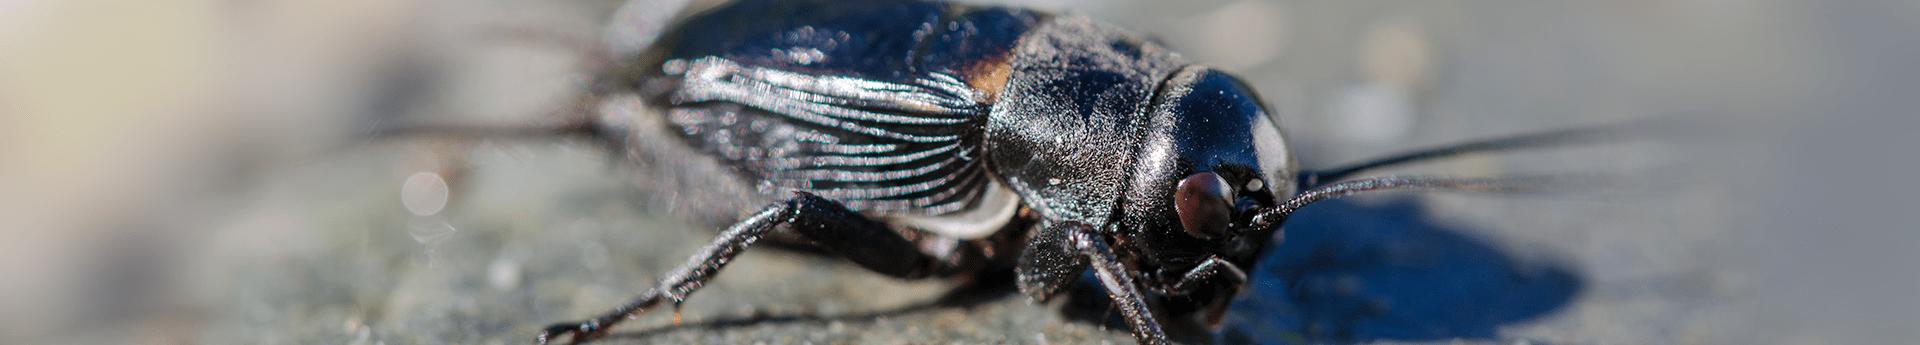 cricket on rock